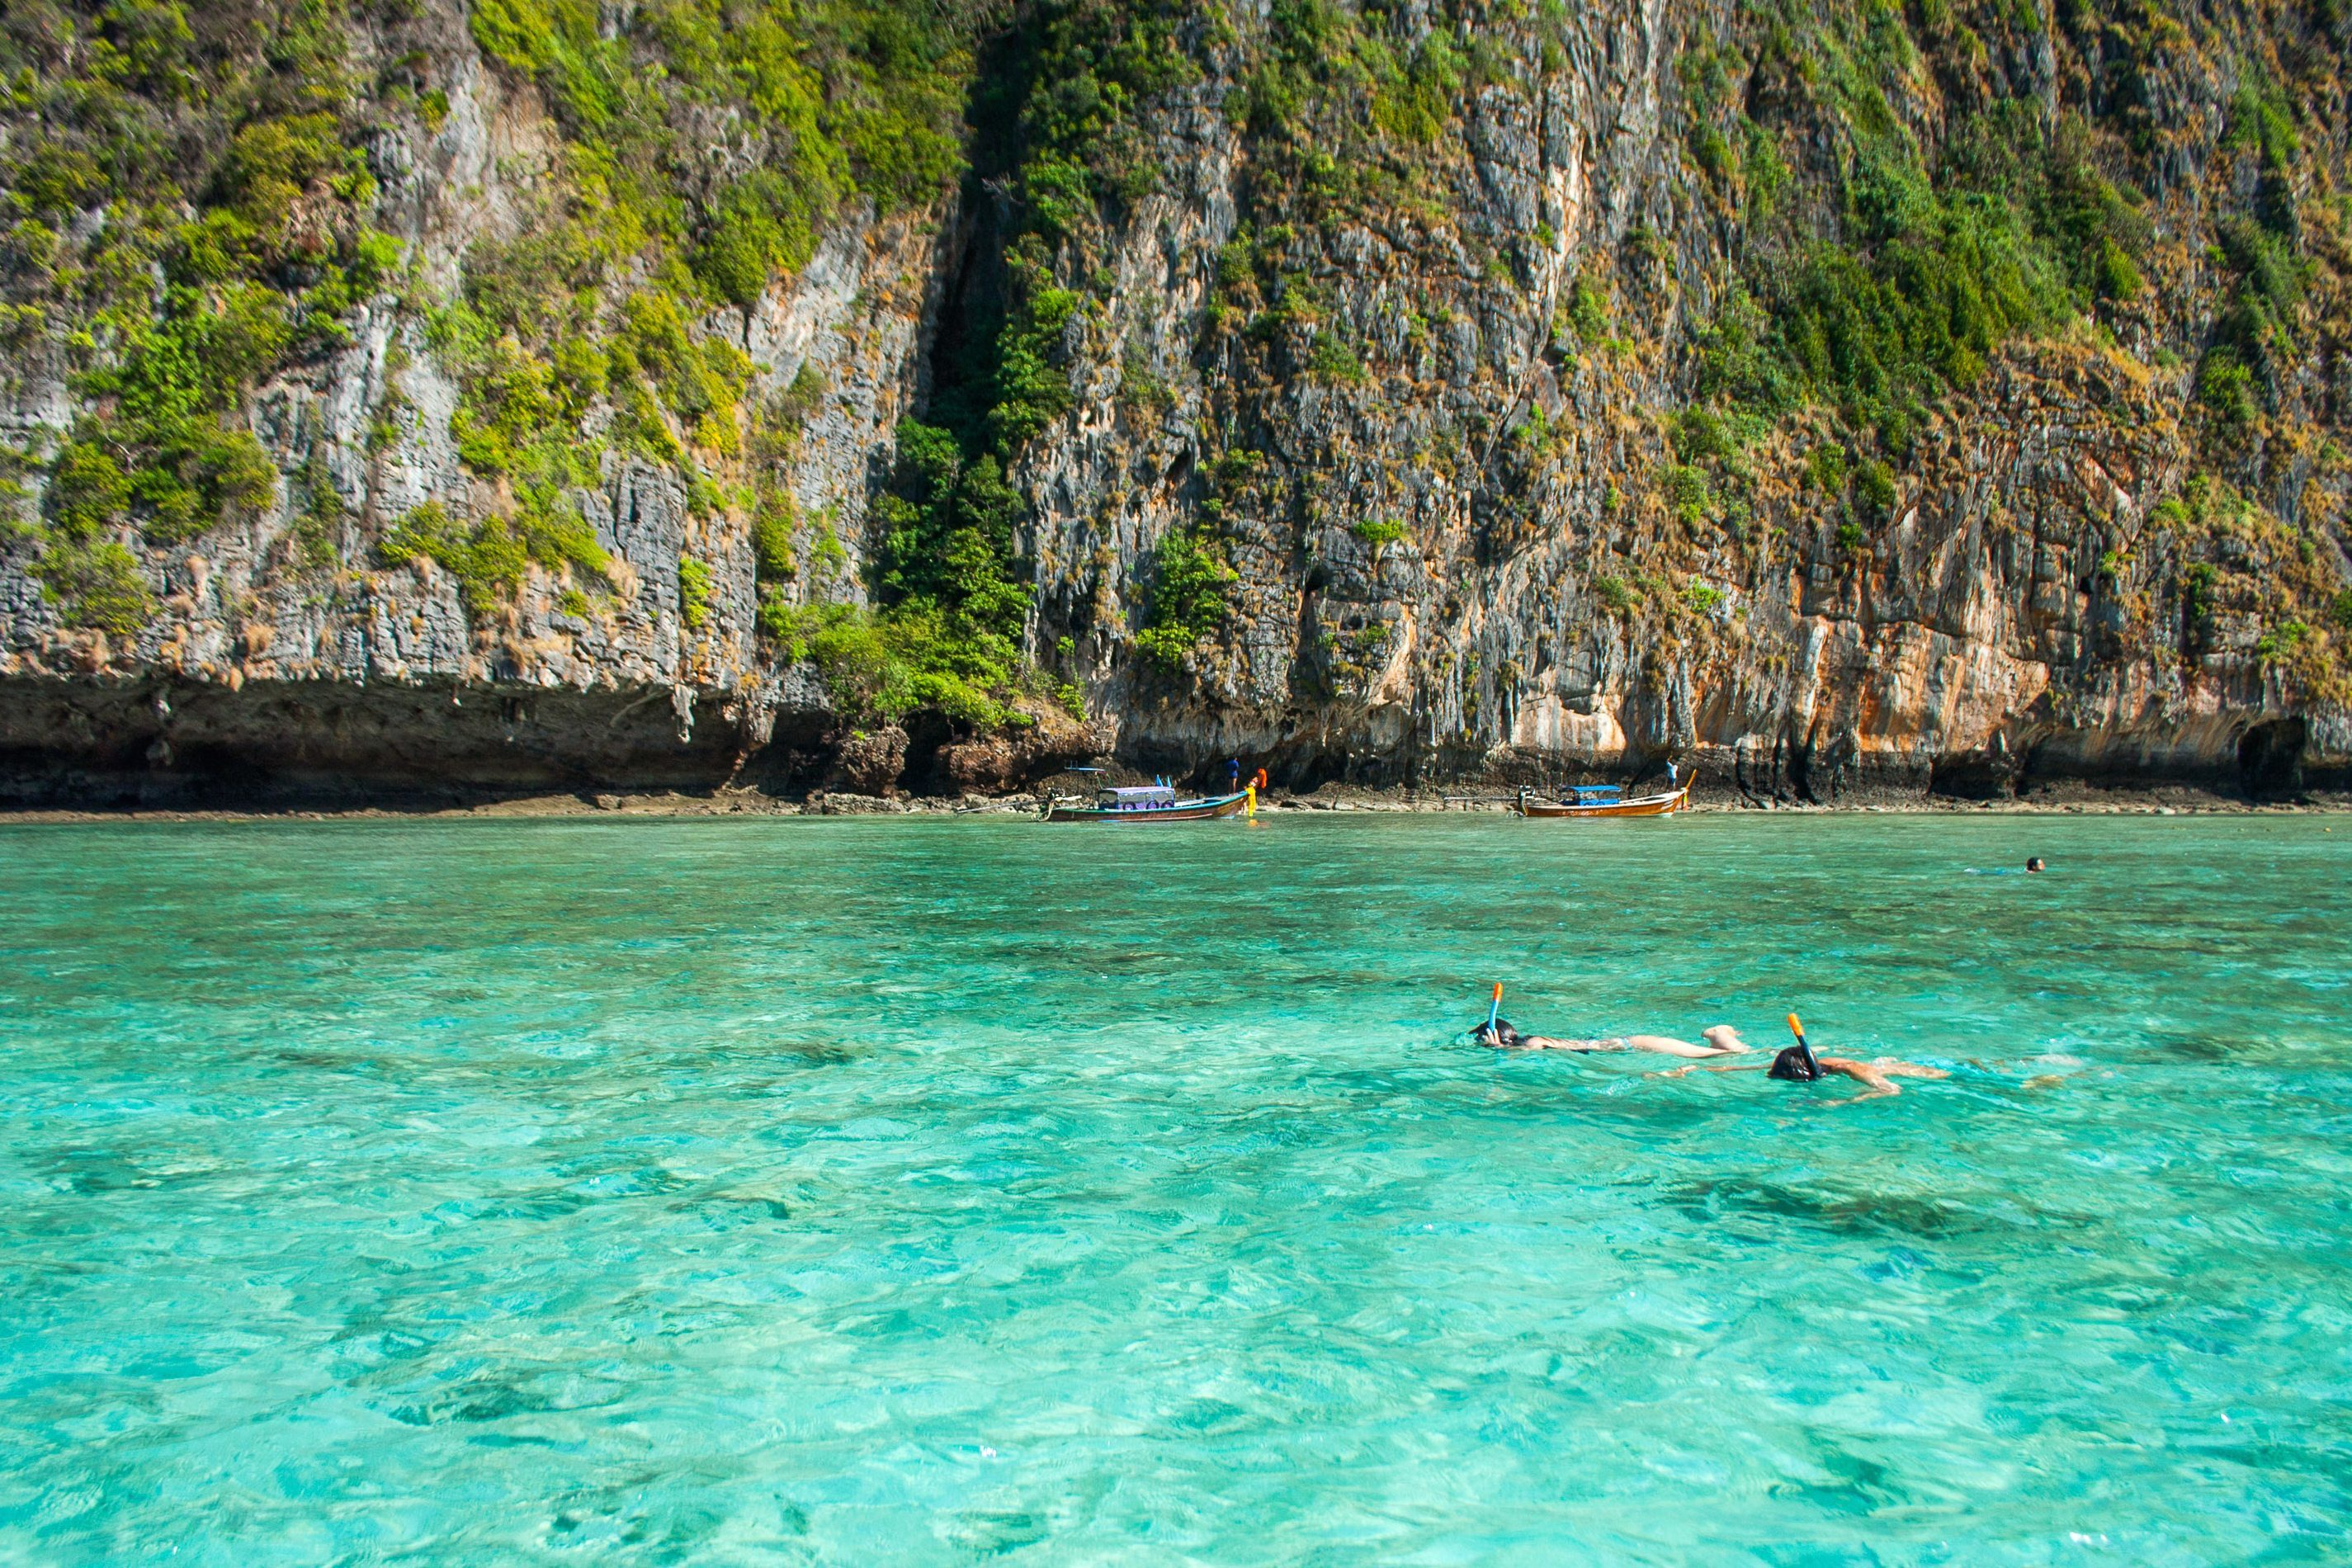 80 Gambar Pemandangan Pantai Paling Hist